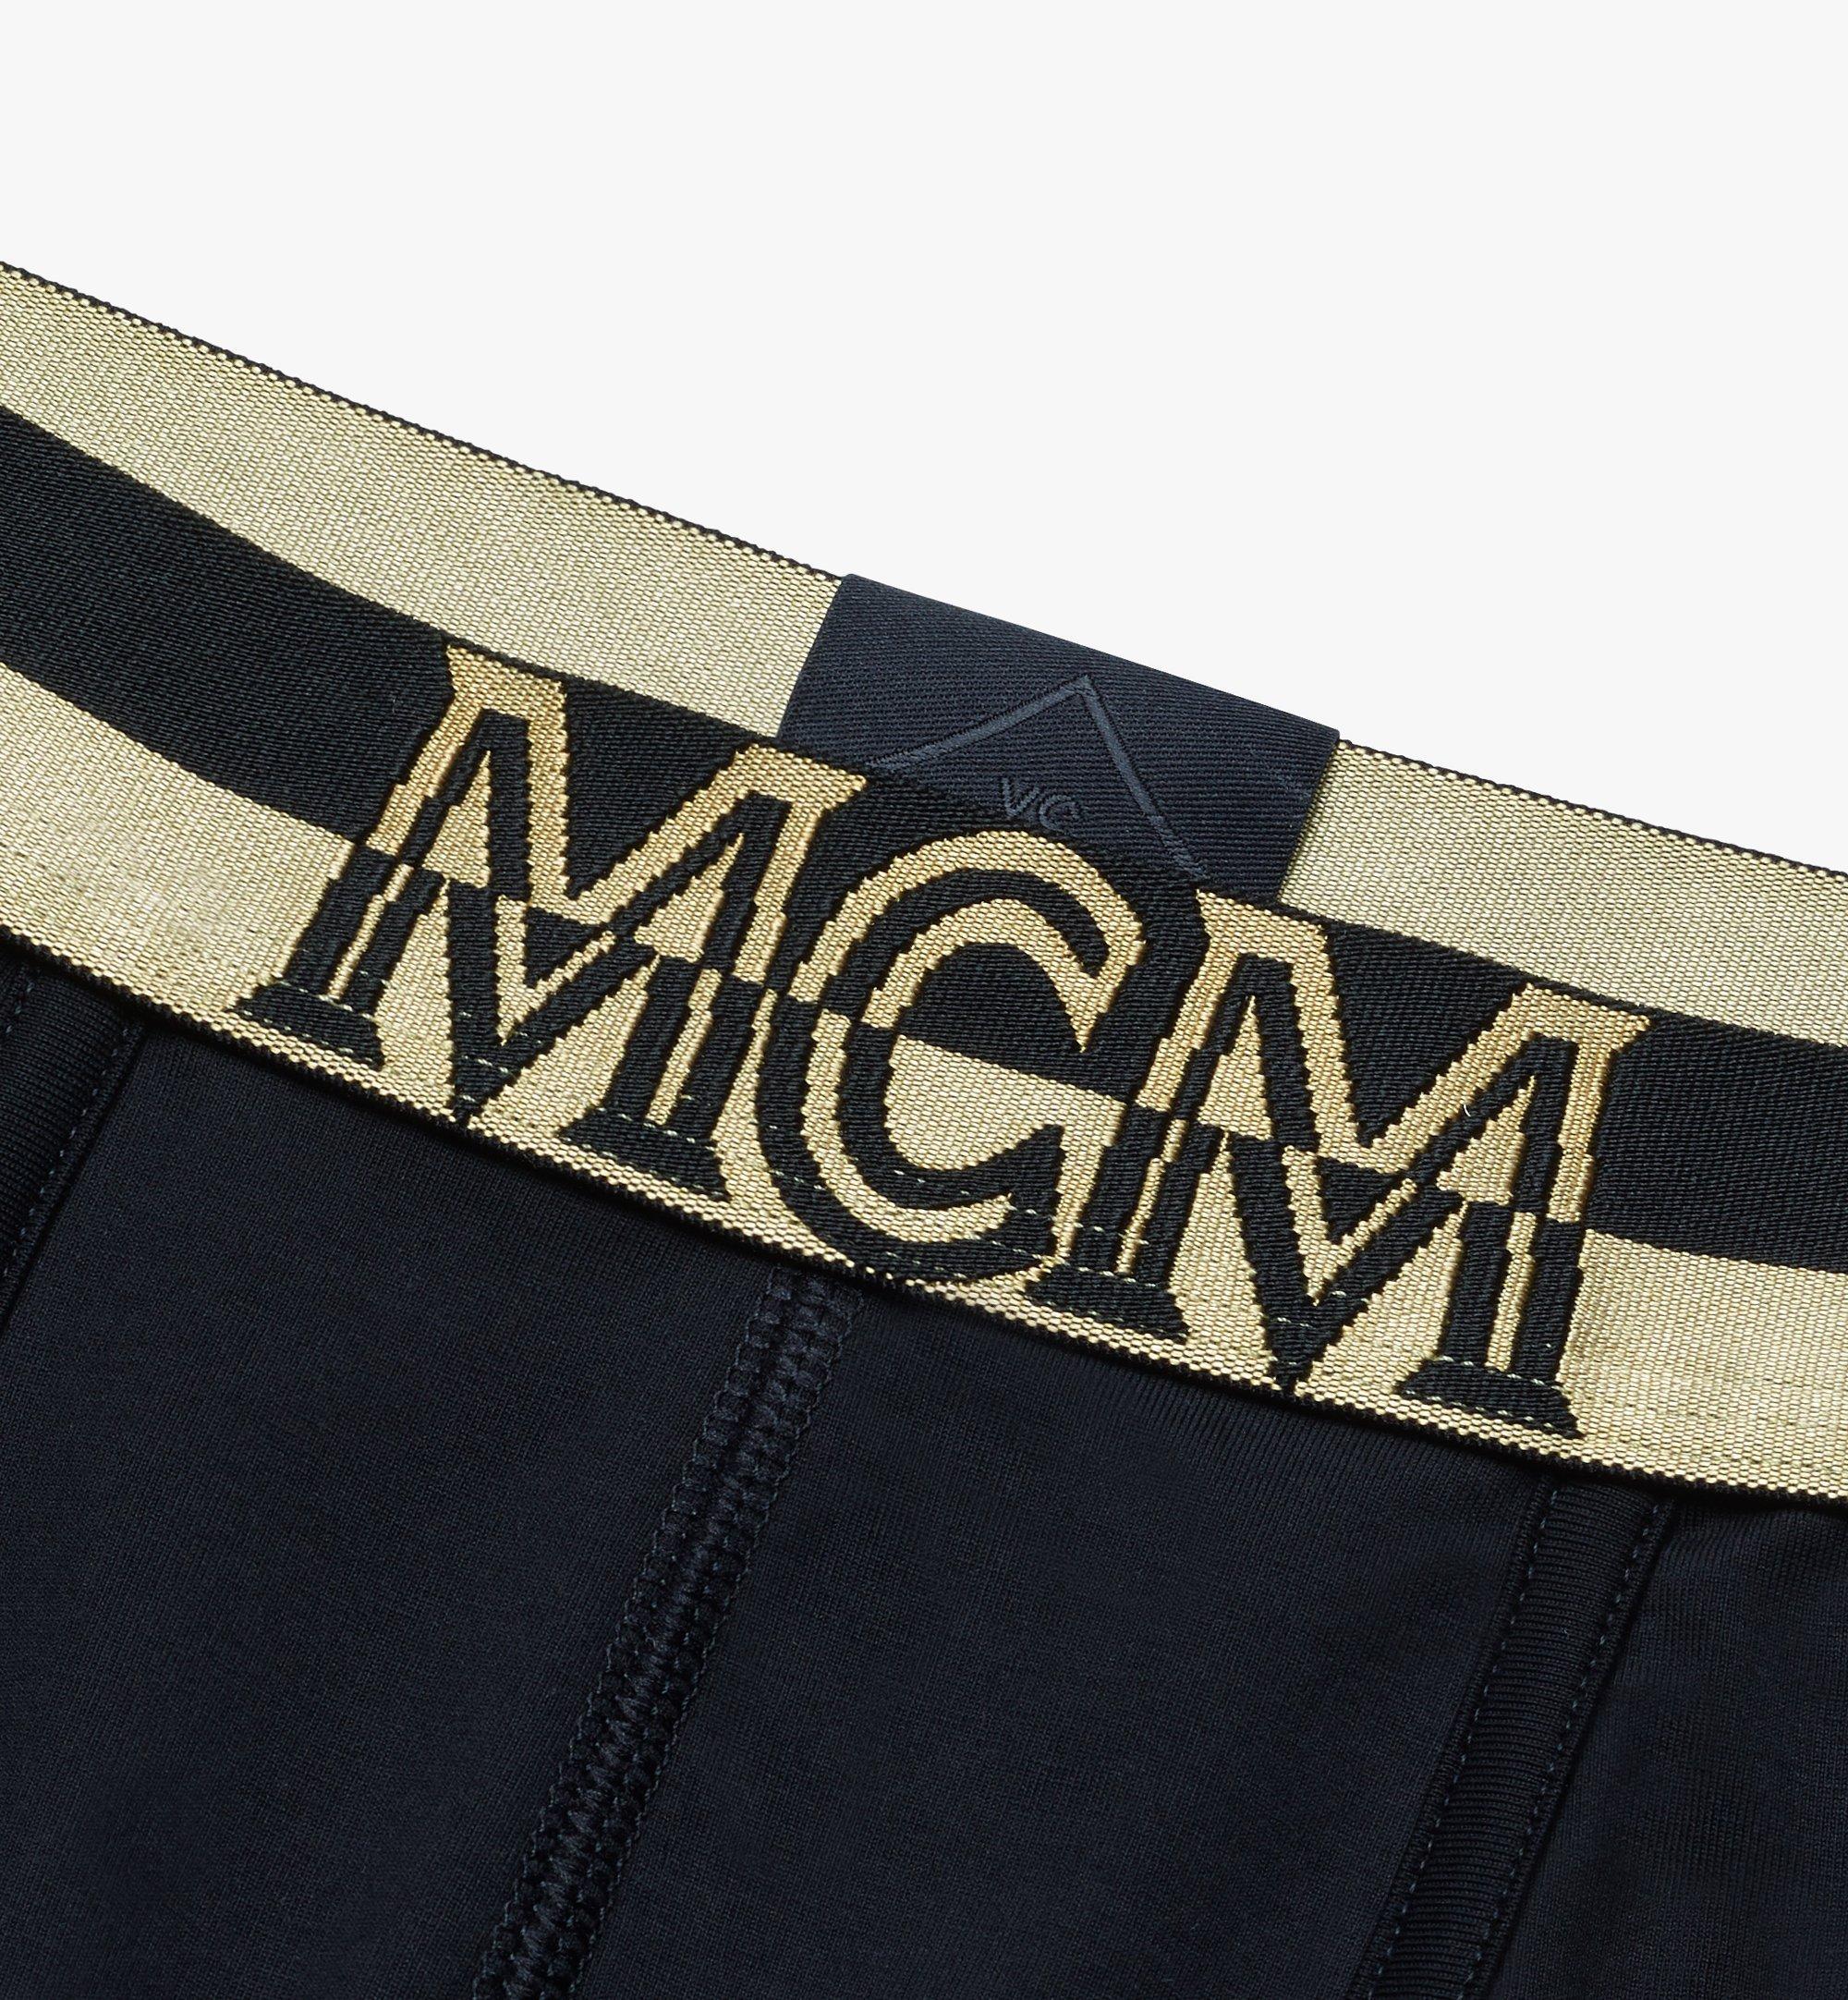 MCM 男士 1976 短款緊身四角褲 Black MHYASBM02BK00M 更多視圖 2